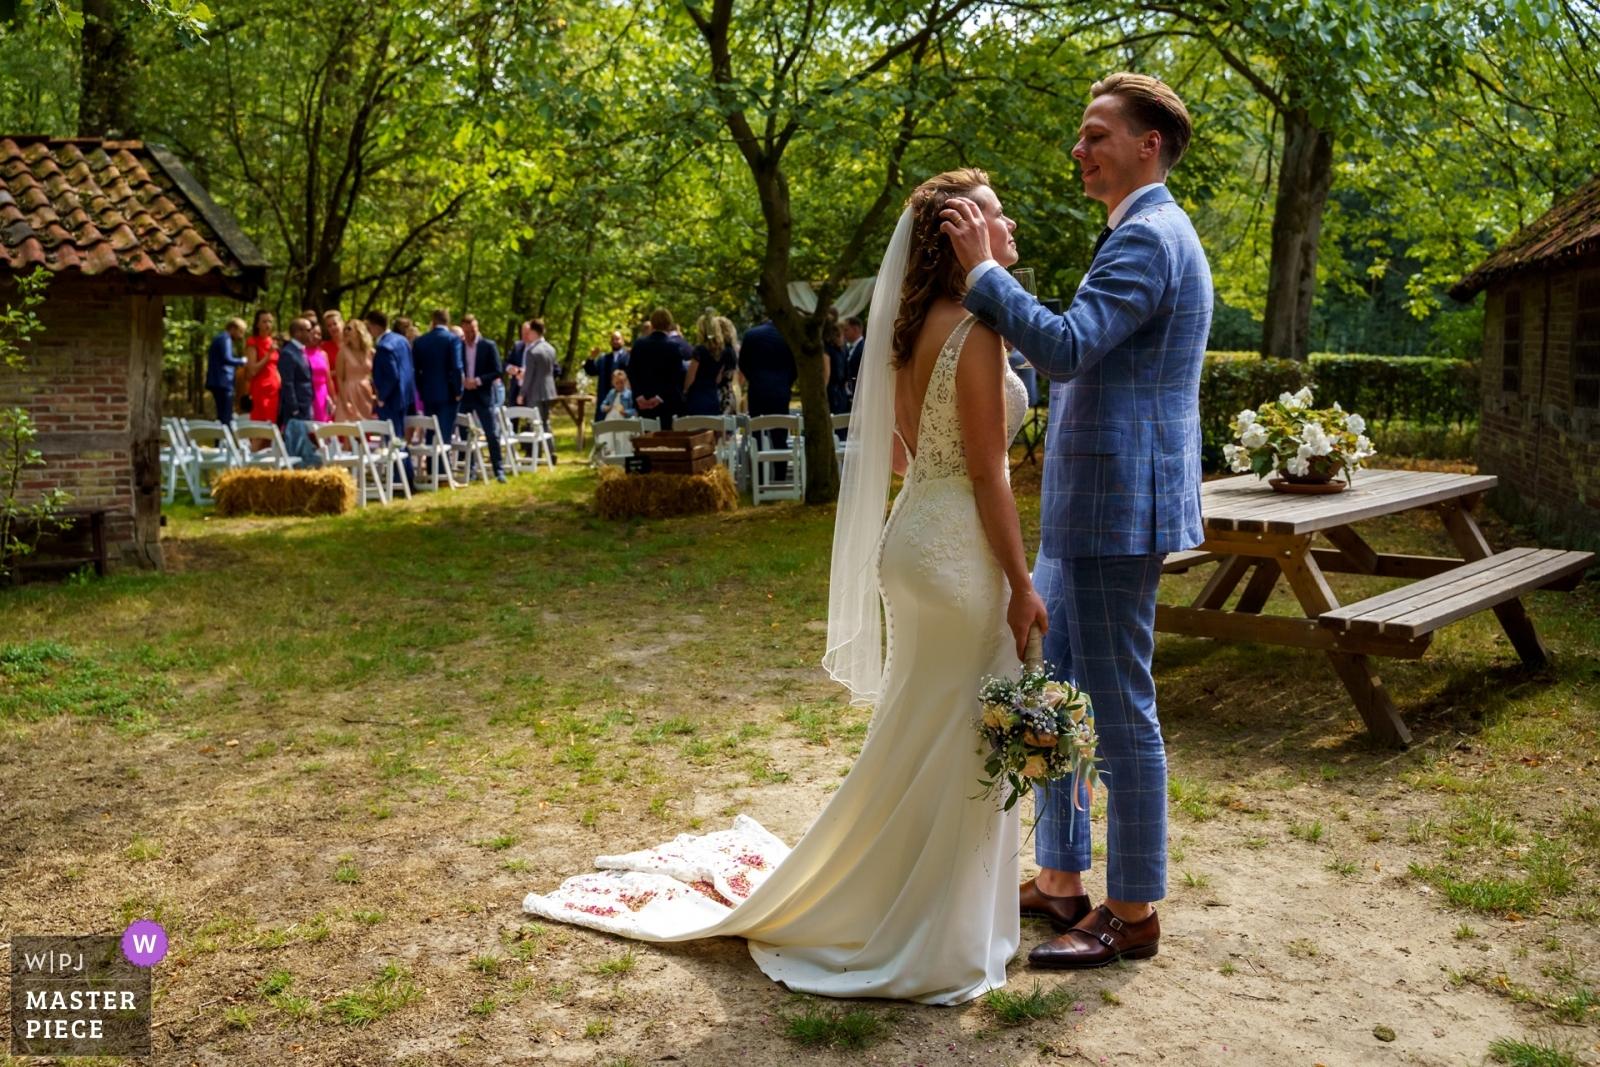 The traces of being just married - Overijssel, Netherlands Wedding Photography -    De Lutte, Jan Wesselinkhoes